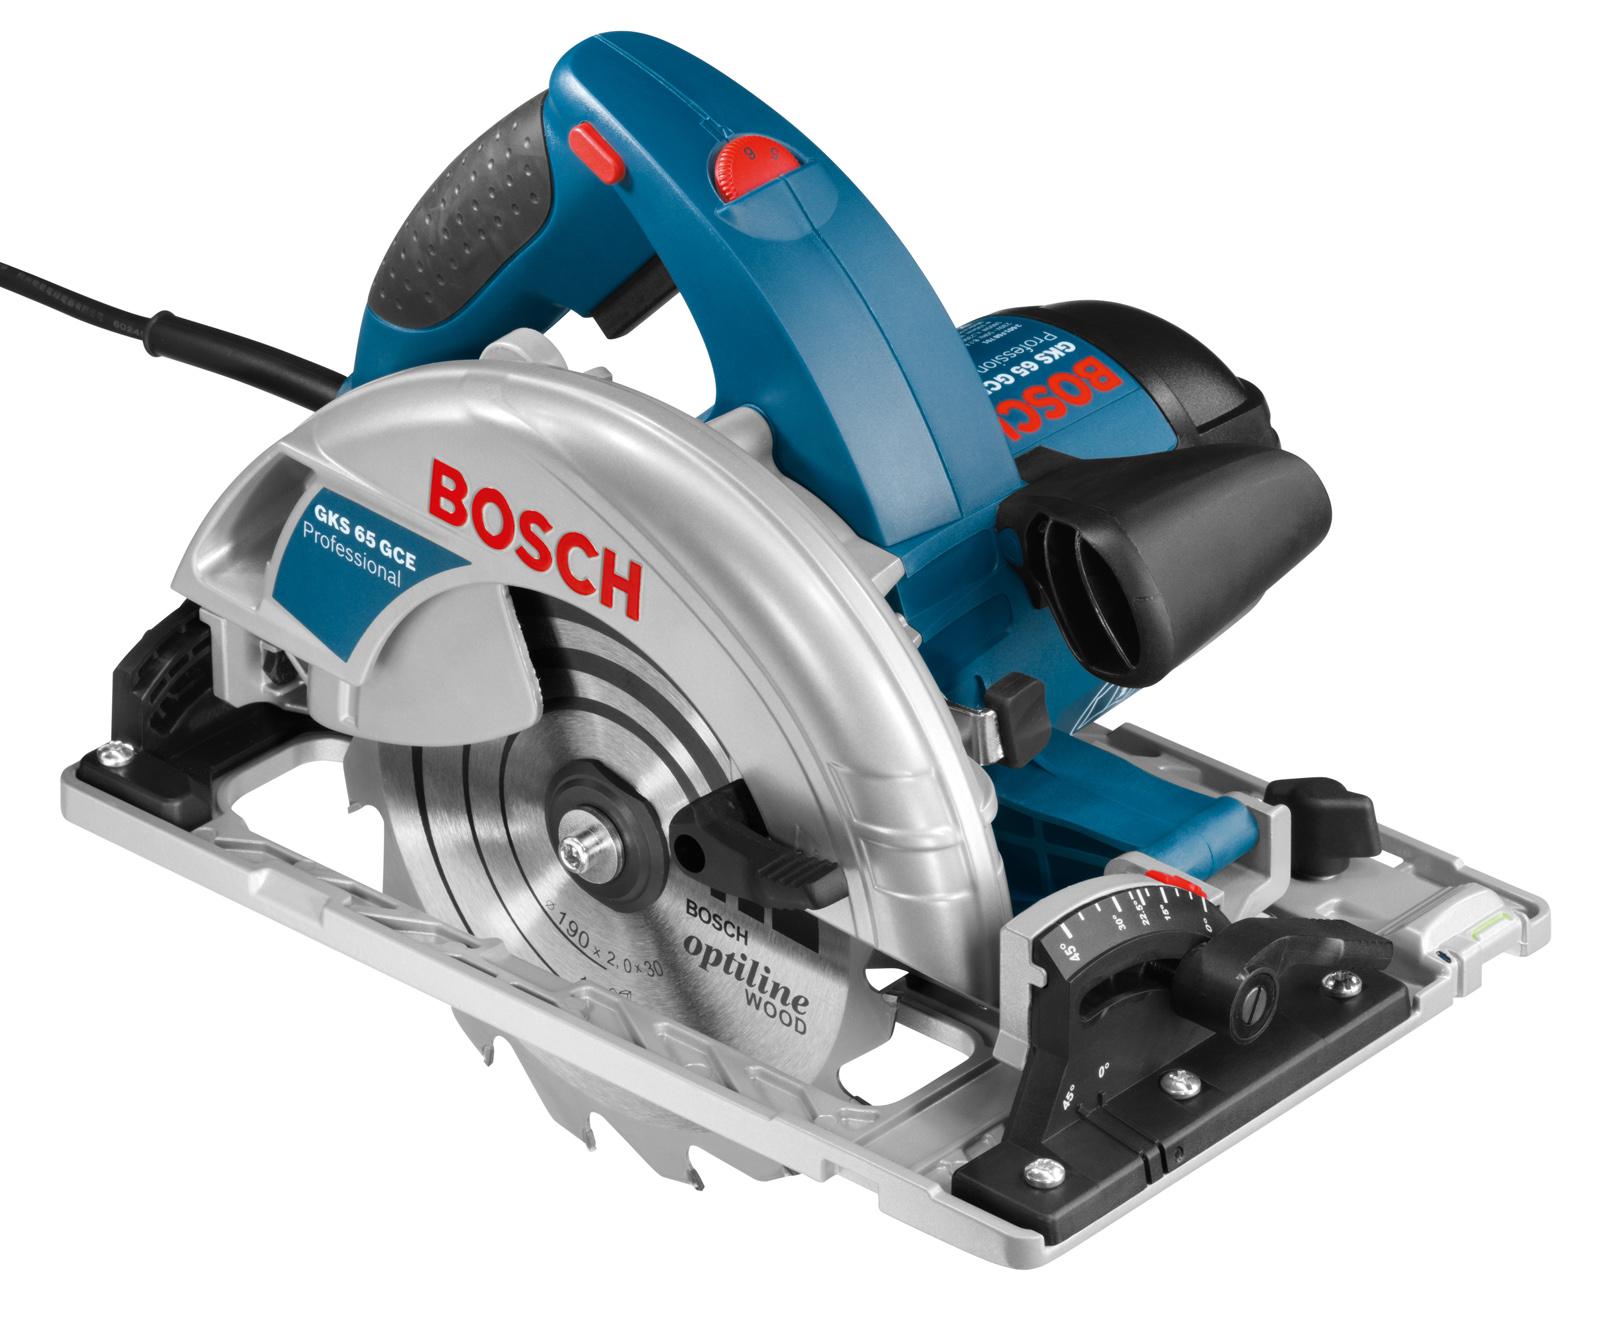 Пила циркулярная Bosch Gks 65 gce (0.601.668.900)  ручная циркулярная пила bosch gks 190 professional